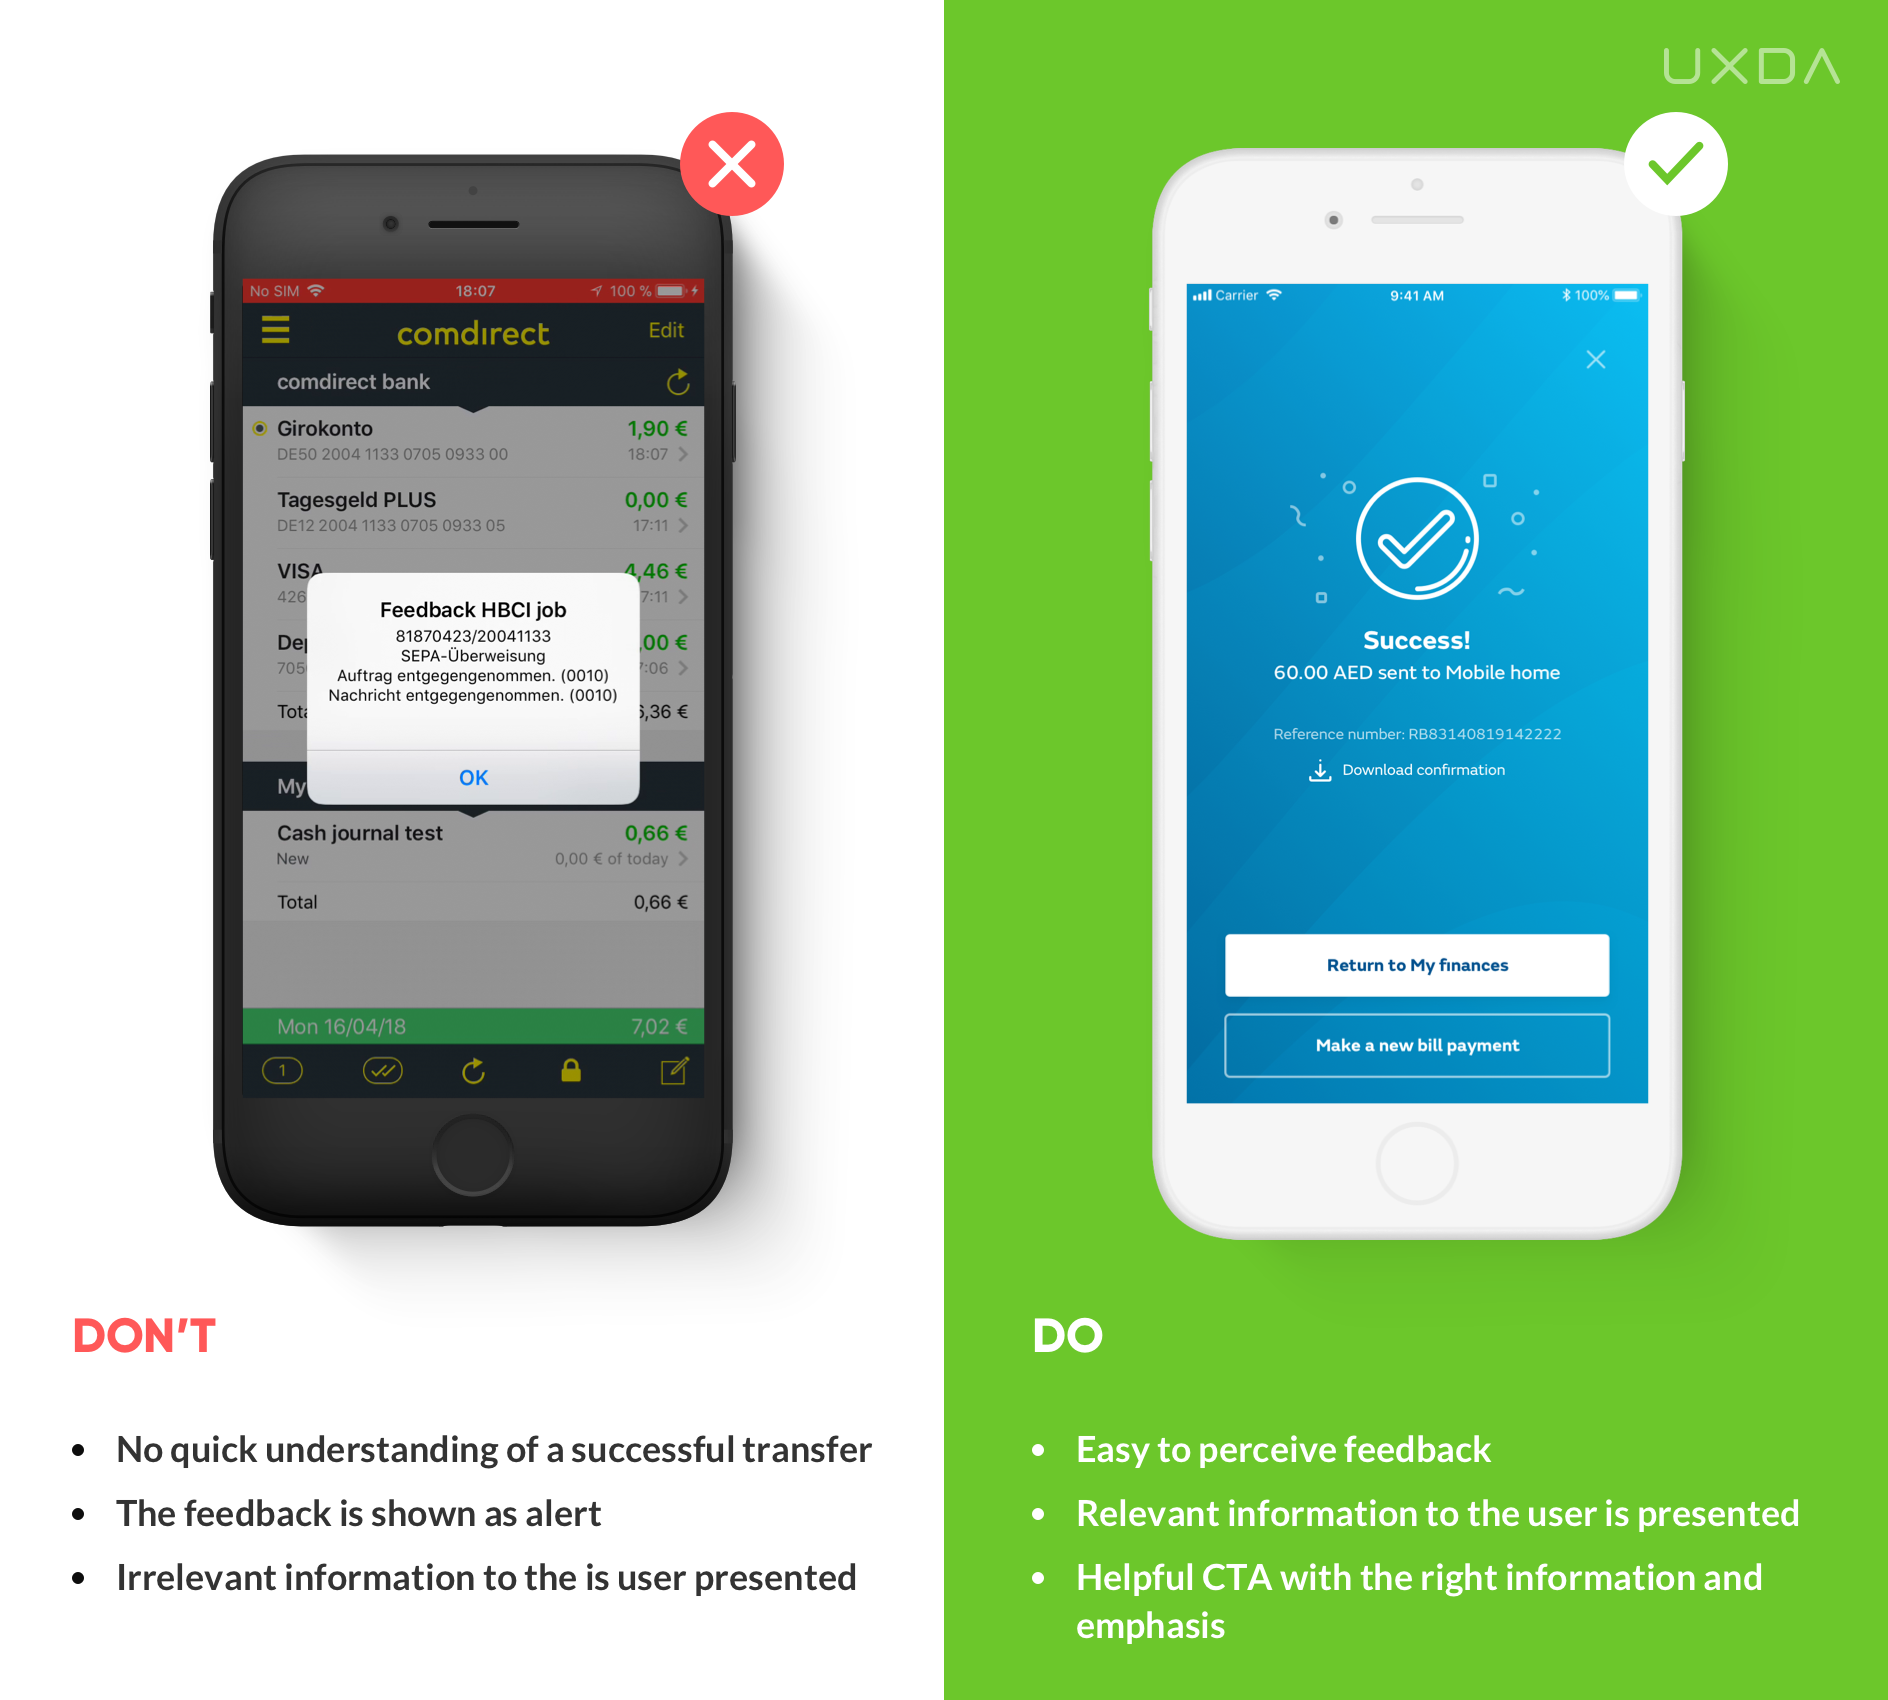 financial-ux-design-for-financial-app-M-8.png